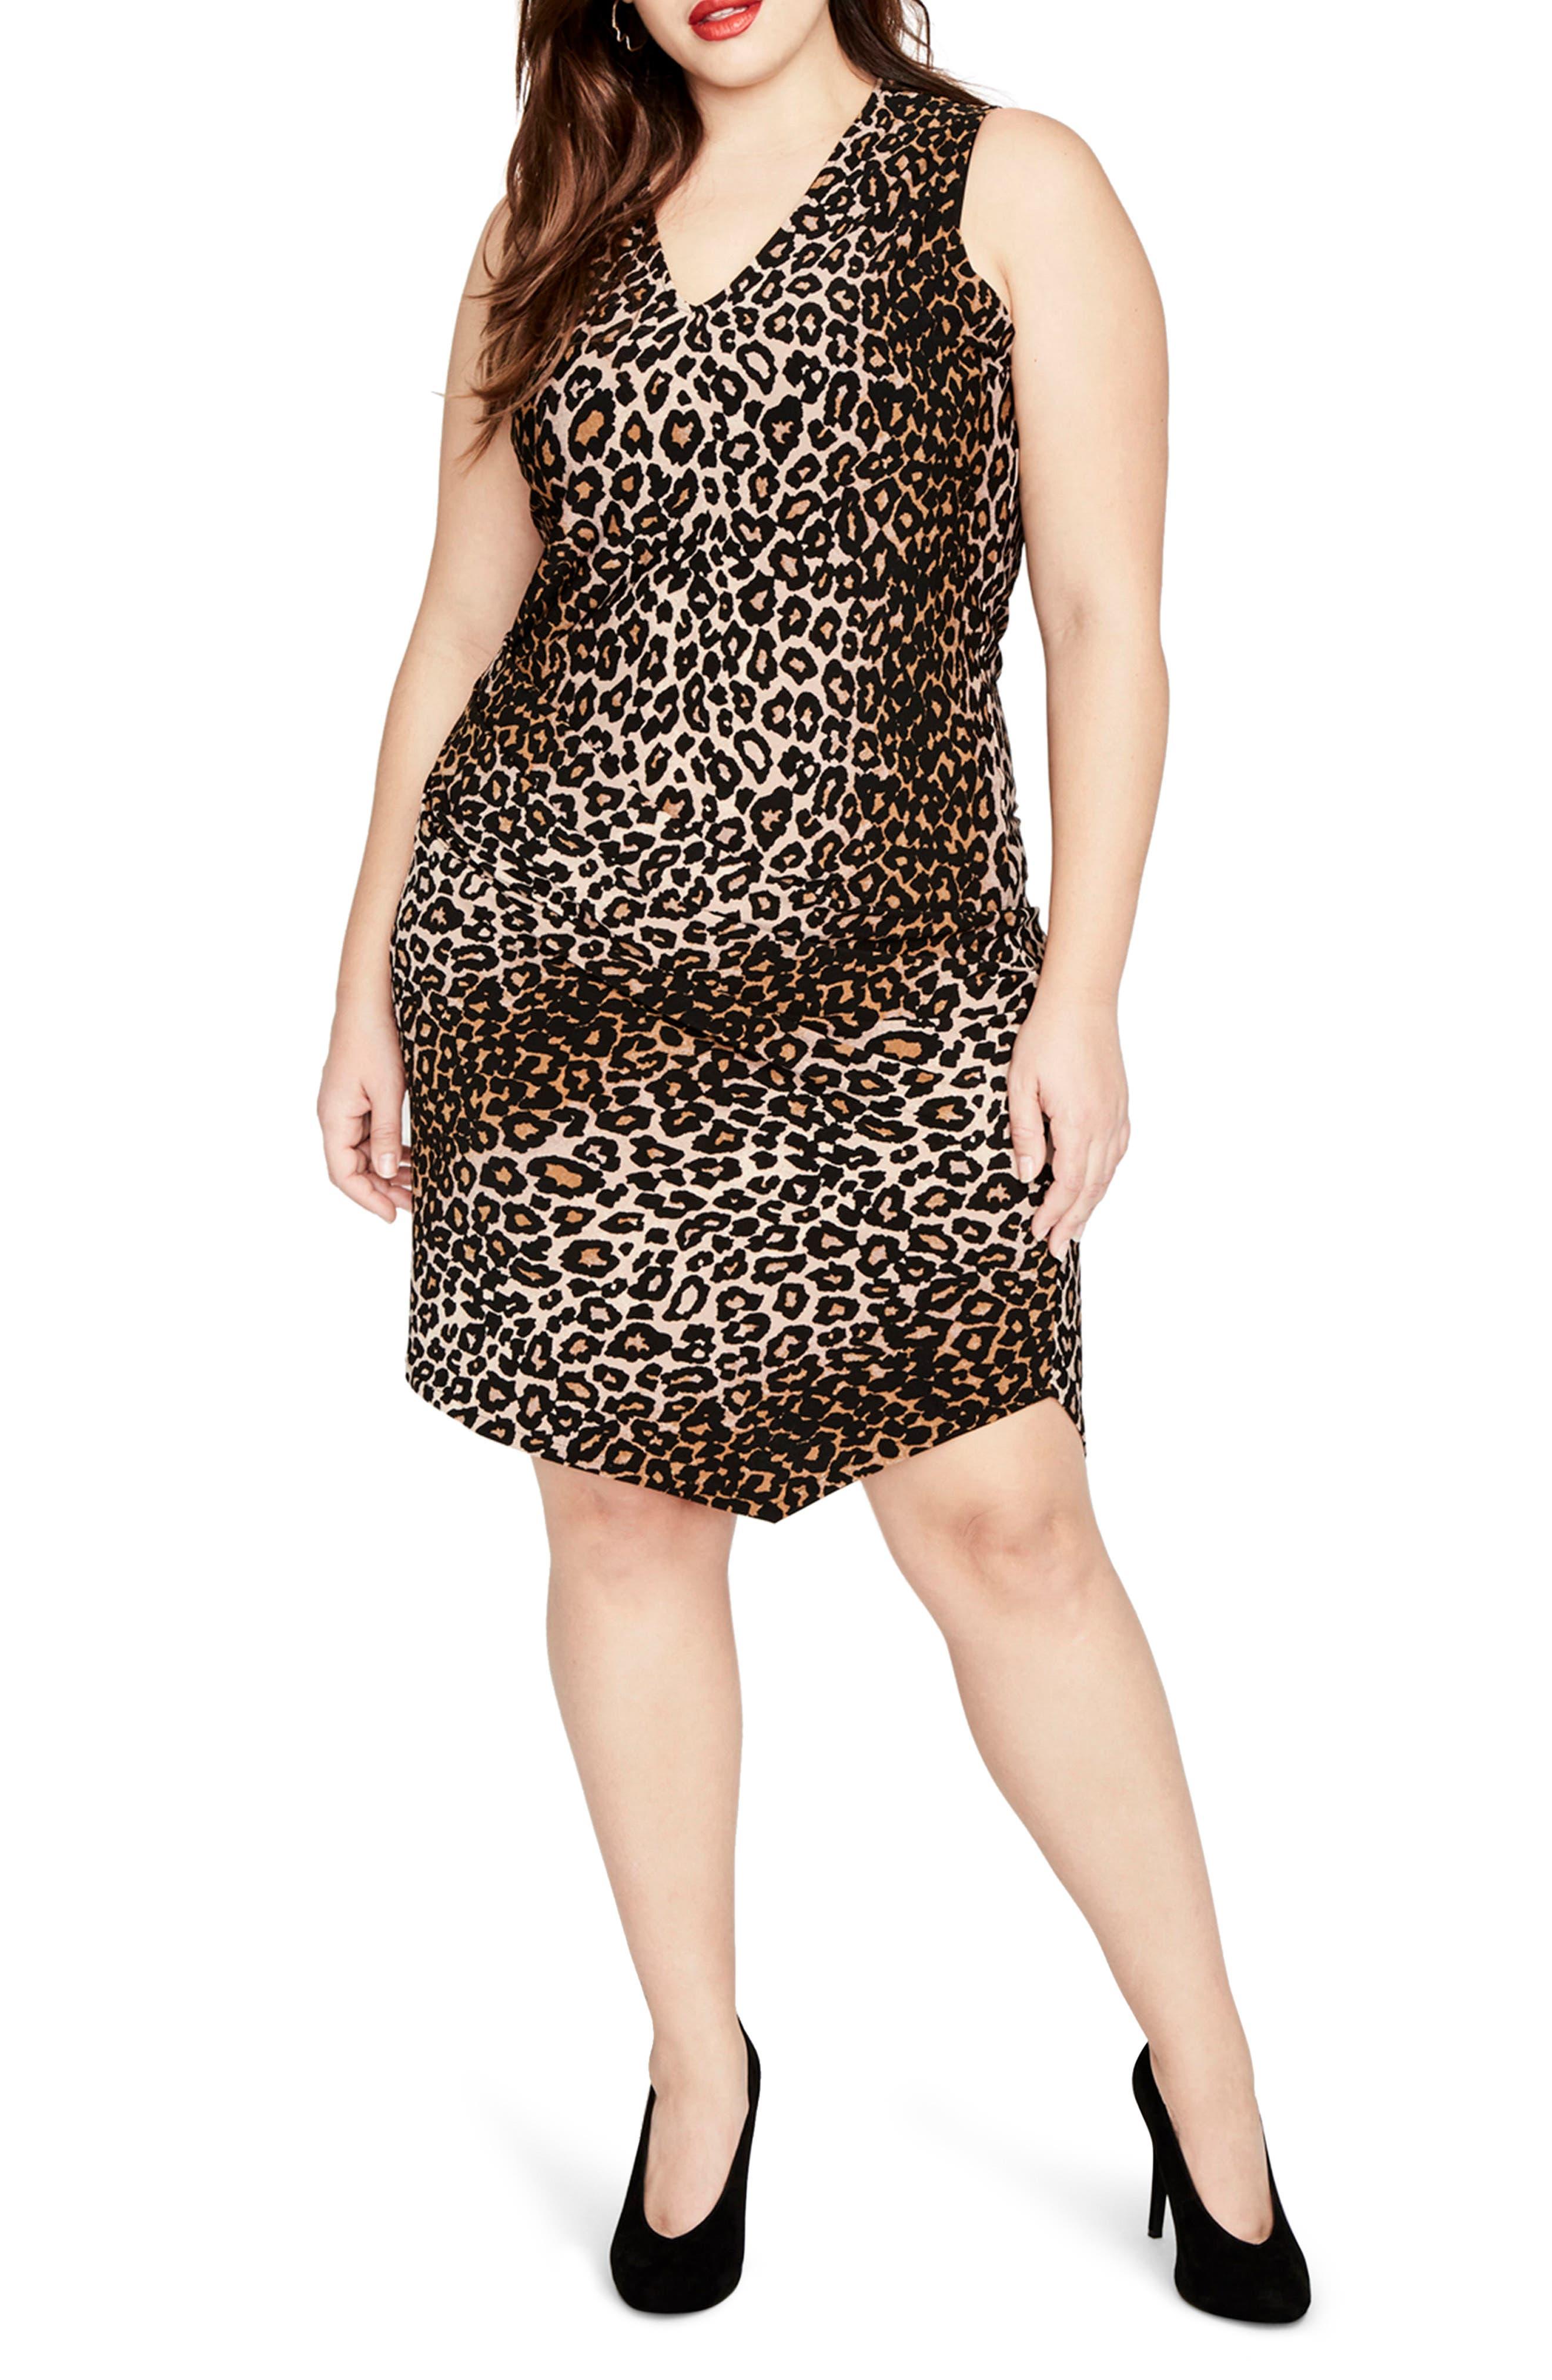 RACHEL BY Rachel Roy Leopard Print Asymmetrical Drape Dress,                             Main thumbnail 1, color,                             270